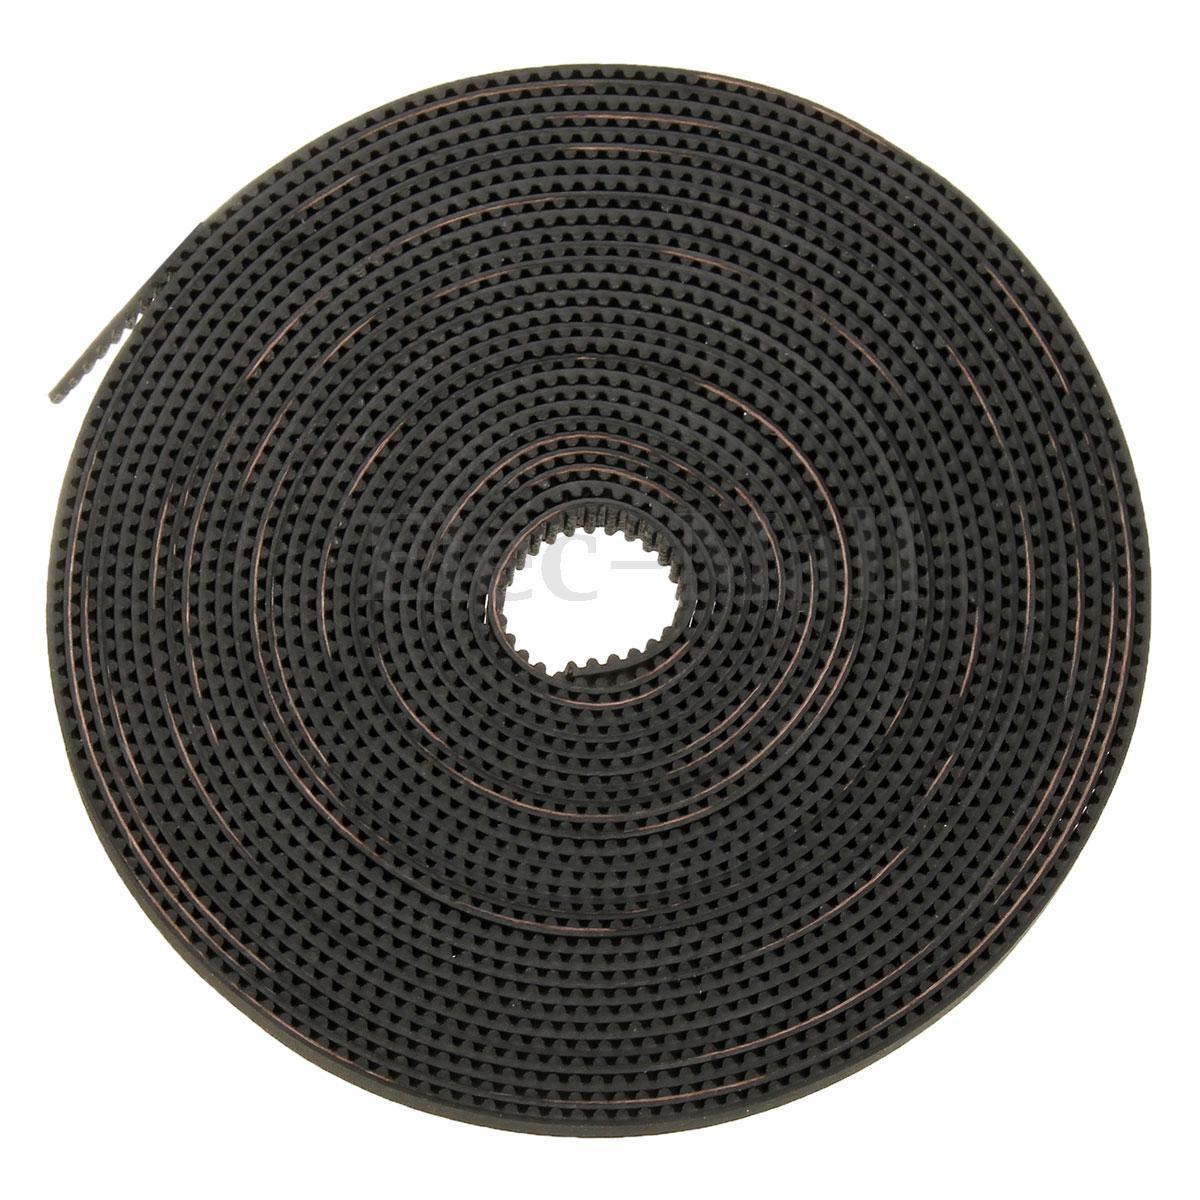 HTD3M timing belt width 10mm 3M Belt for CNC and step motor